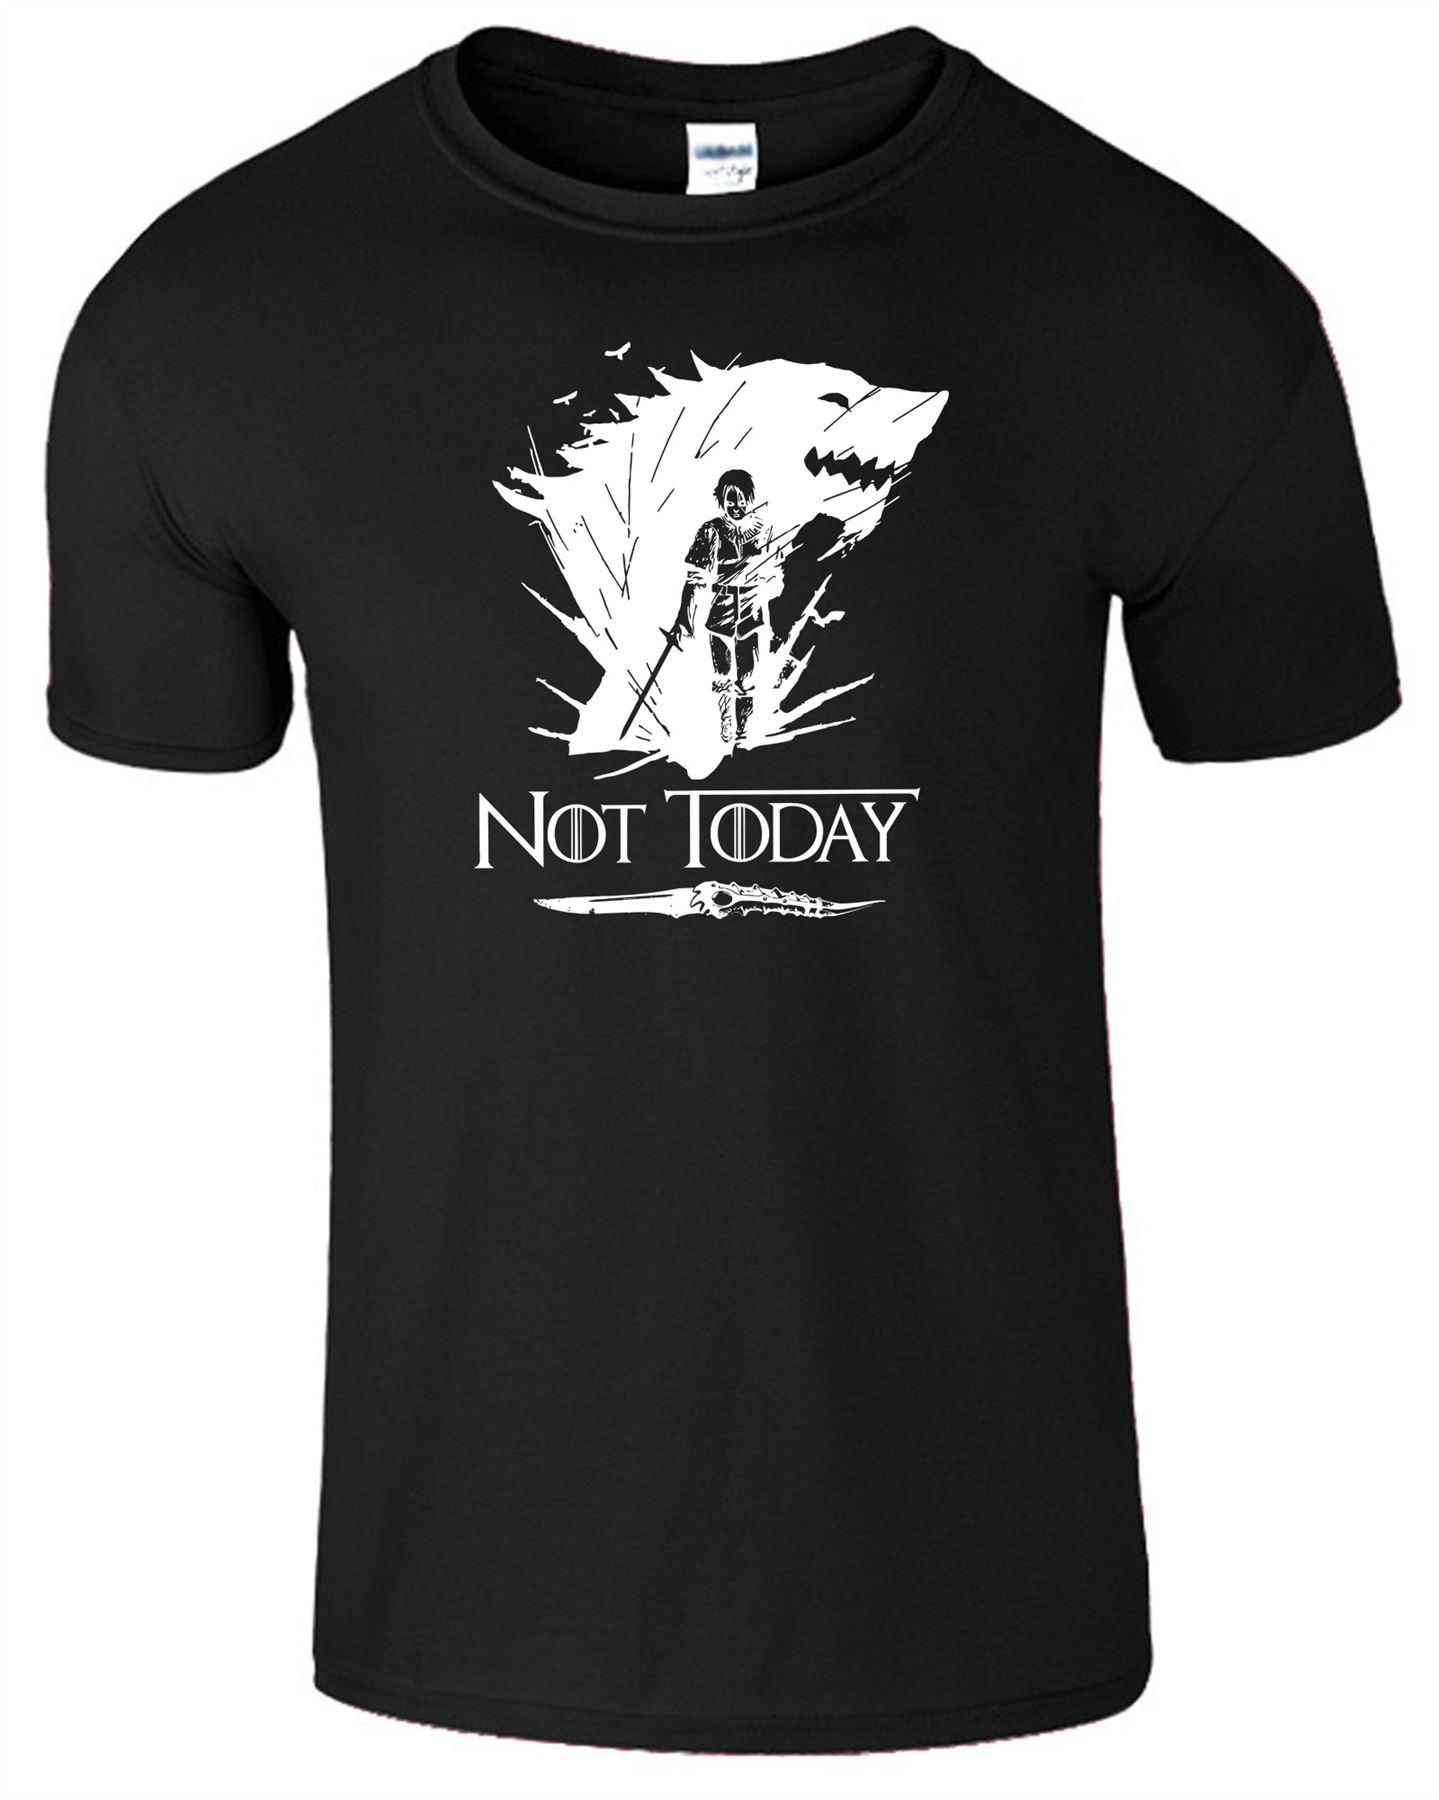 Arya-Stark-Not-Today-T-Shirt-Mens-Game-Season-Womens-Shirt-Adults-Unisex-Fit Indexbild 2